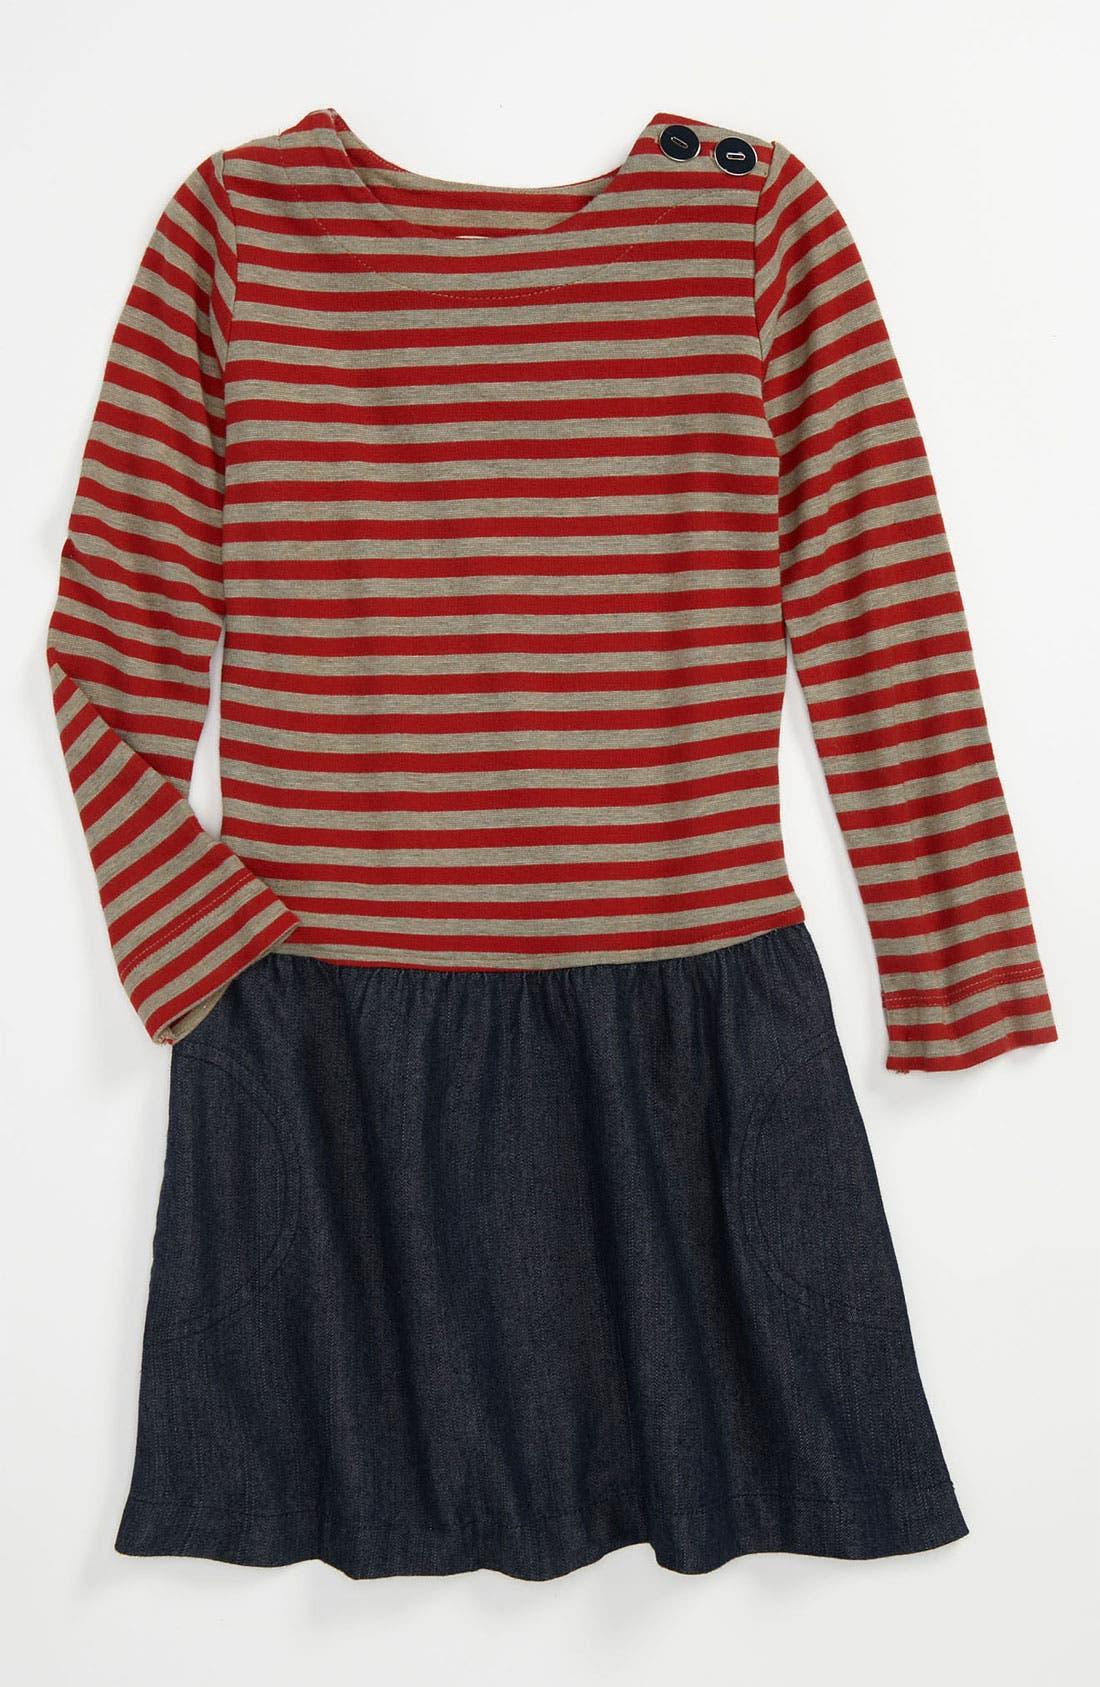 Alternate Image 1 Selected - Anthem of the Ants 'Museum' Stripe Dress (Little Girls & Big Girls)